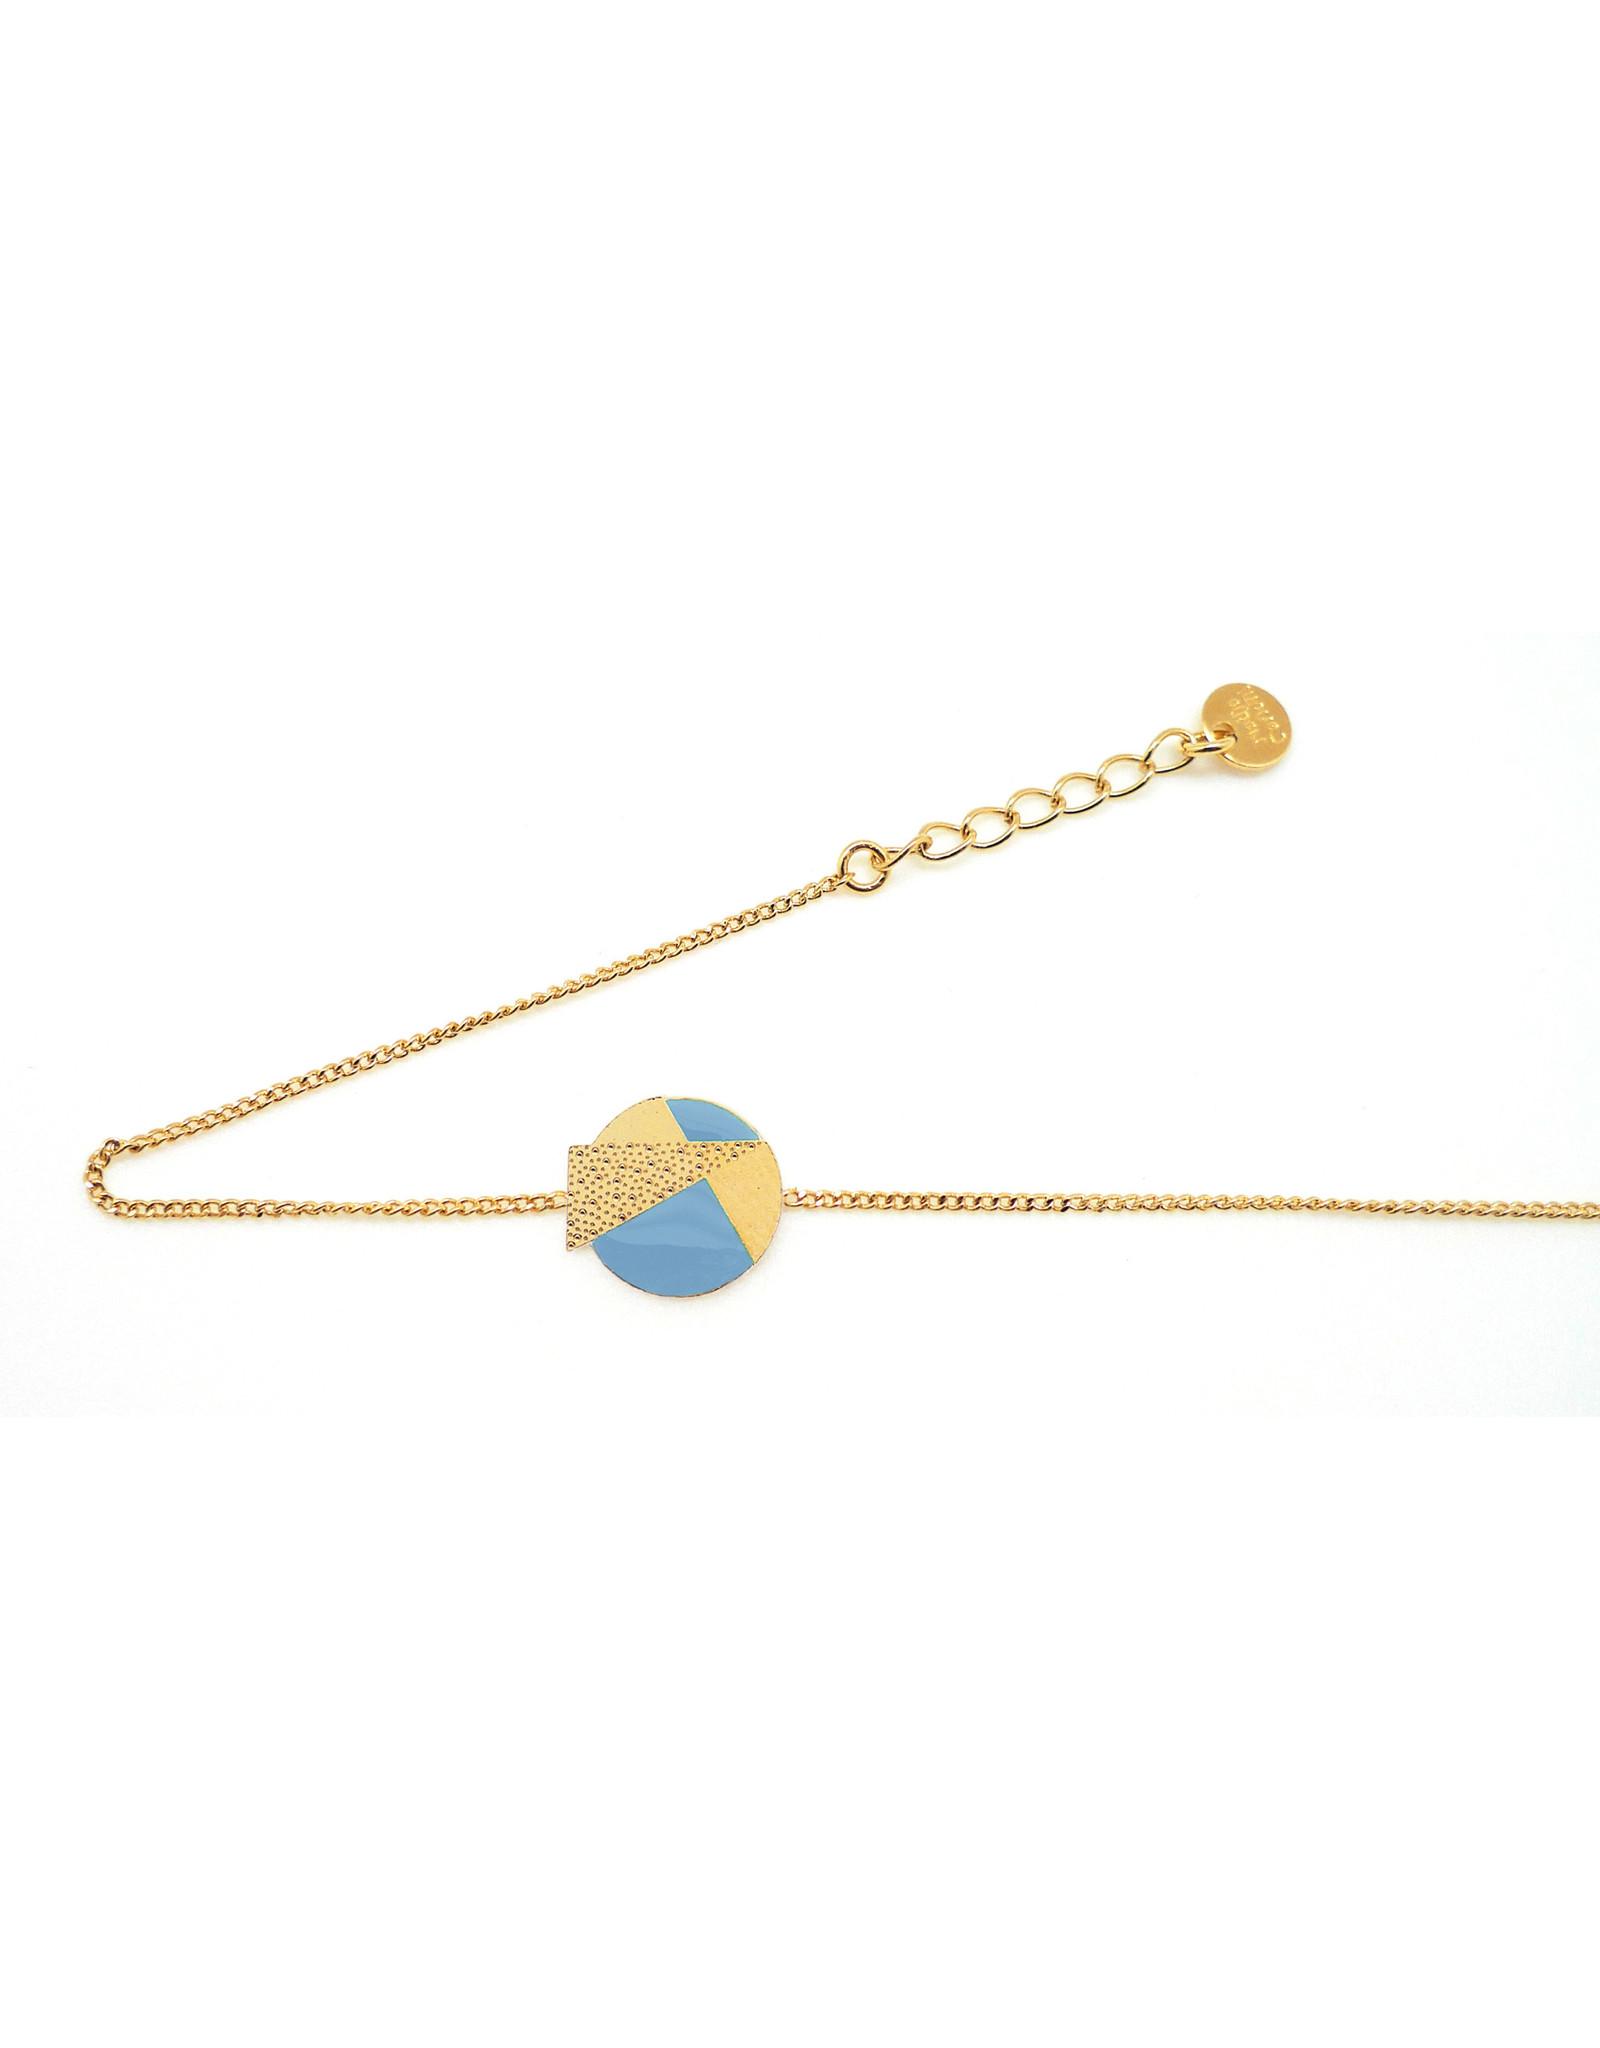 Nadja Carlotti Armband Lizzy - Licht Blauw - Messing Verguld